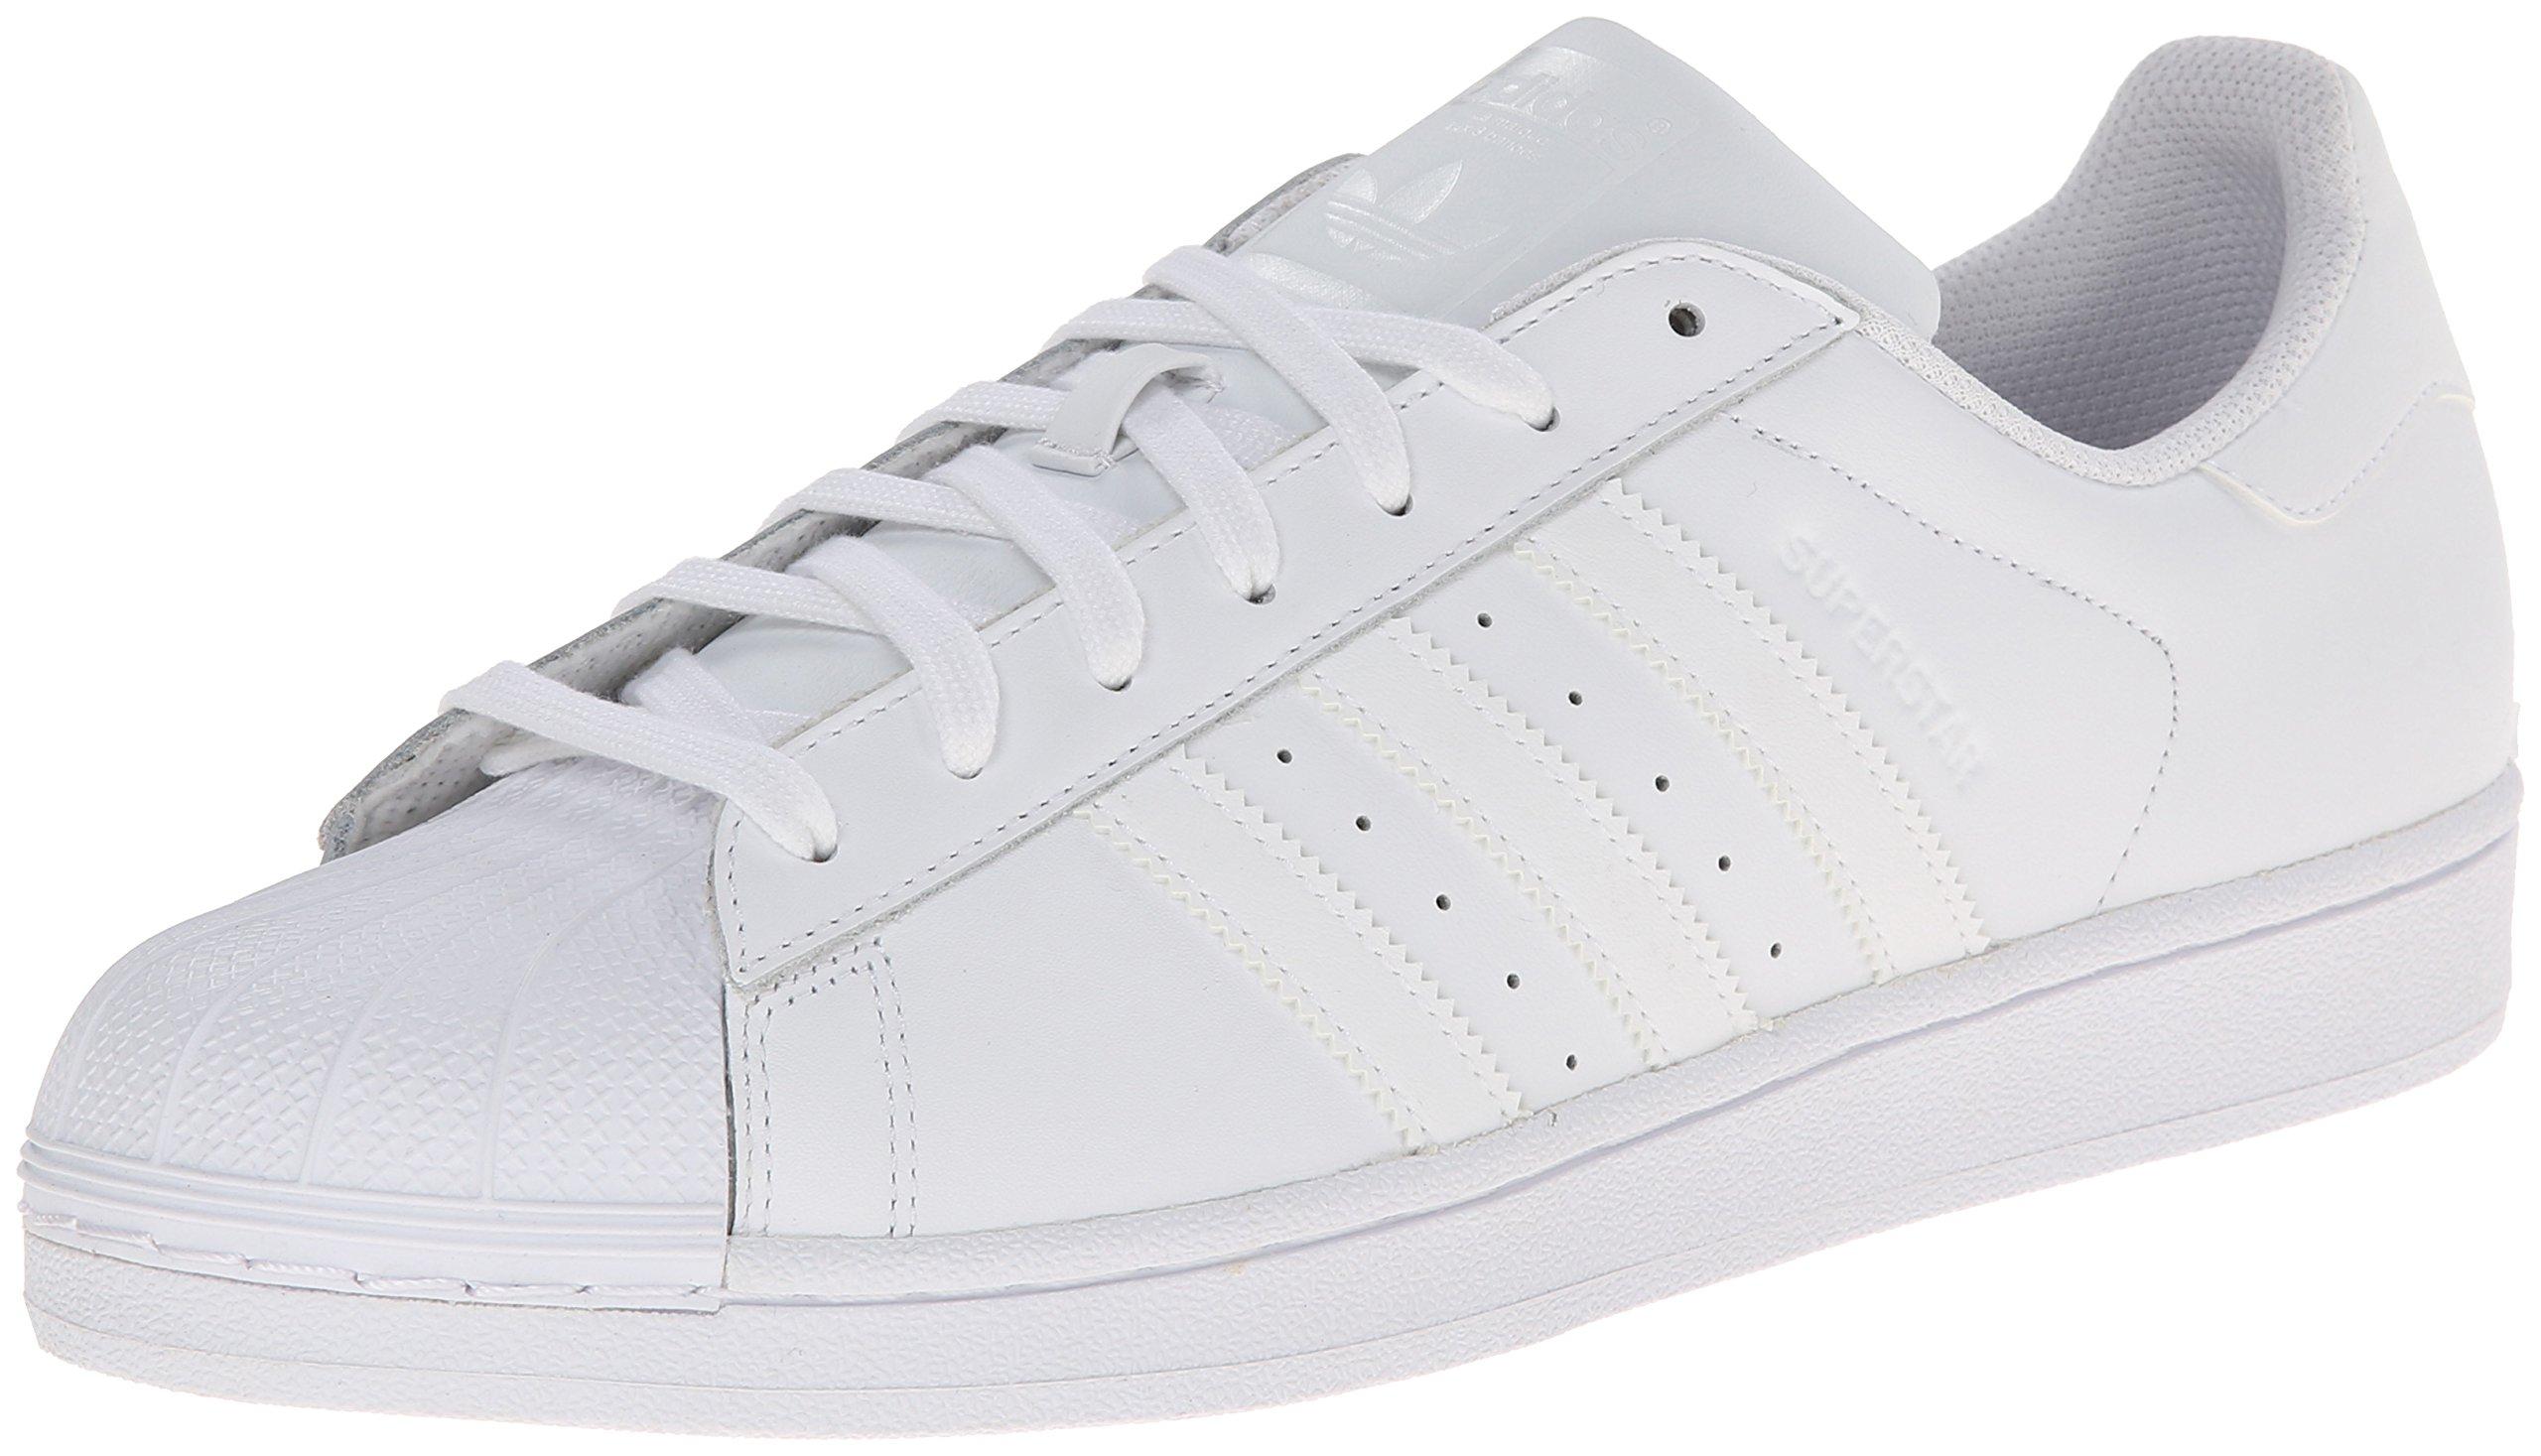 adidas Originals Men's Superstar Foundation Casual Sneaker, White/Running White/White, 17 D(M) US